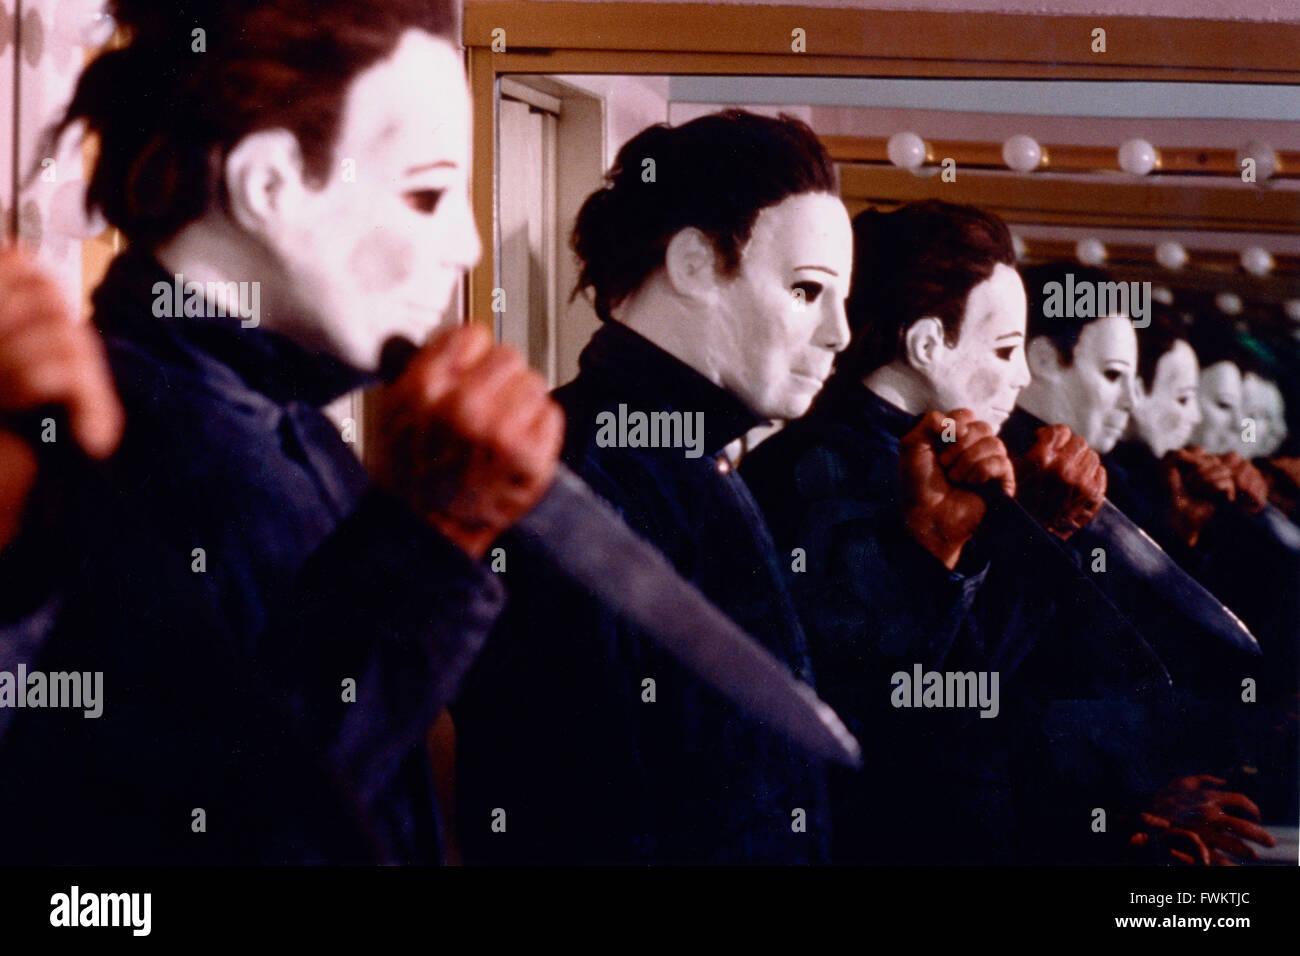 Halloween 4: The Return Of Michael Myers, aka: Halloween 4 ...